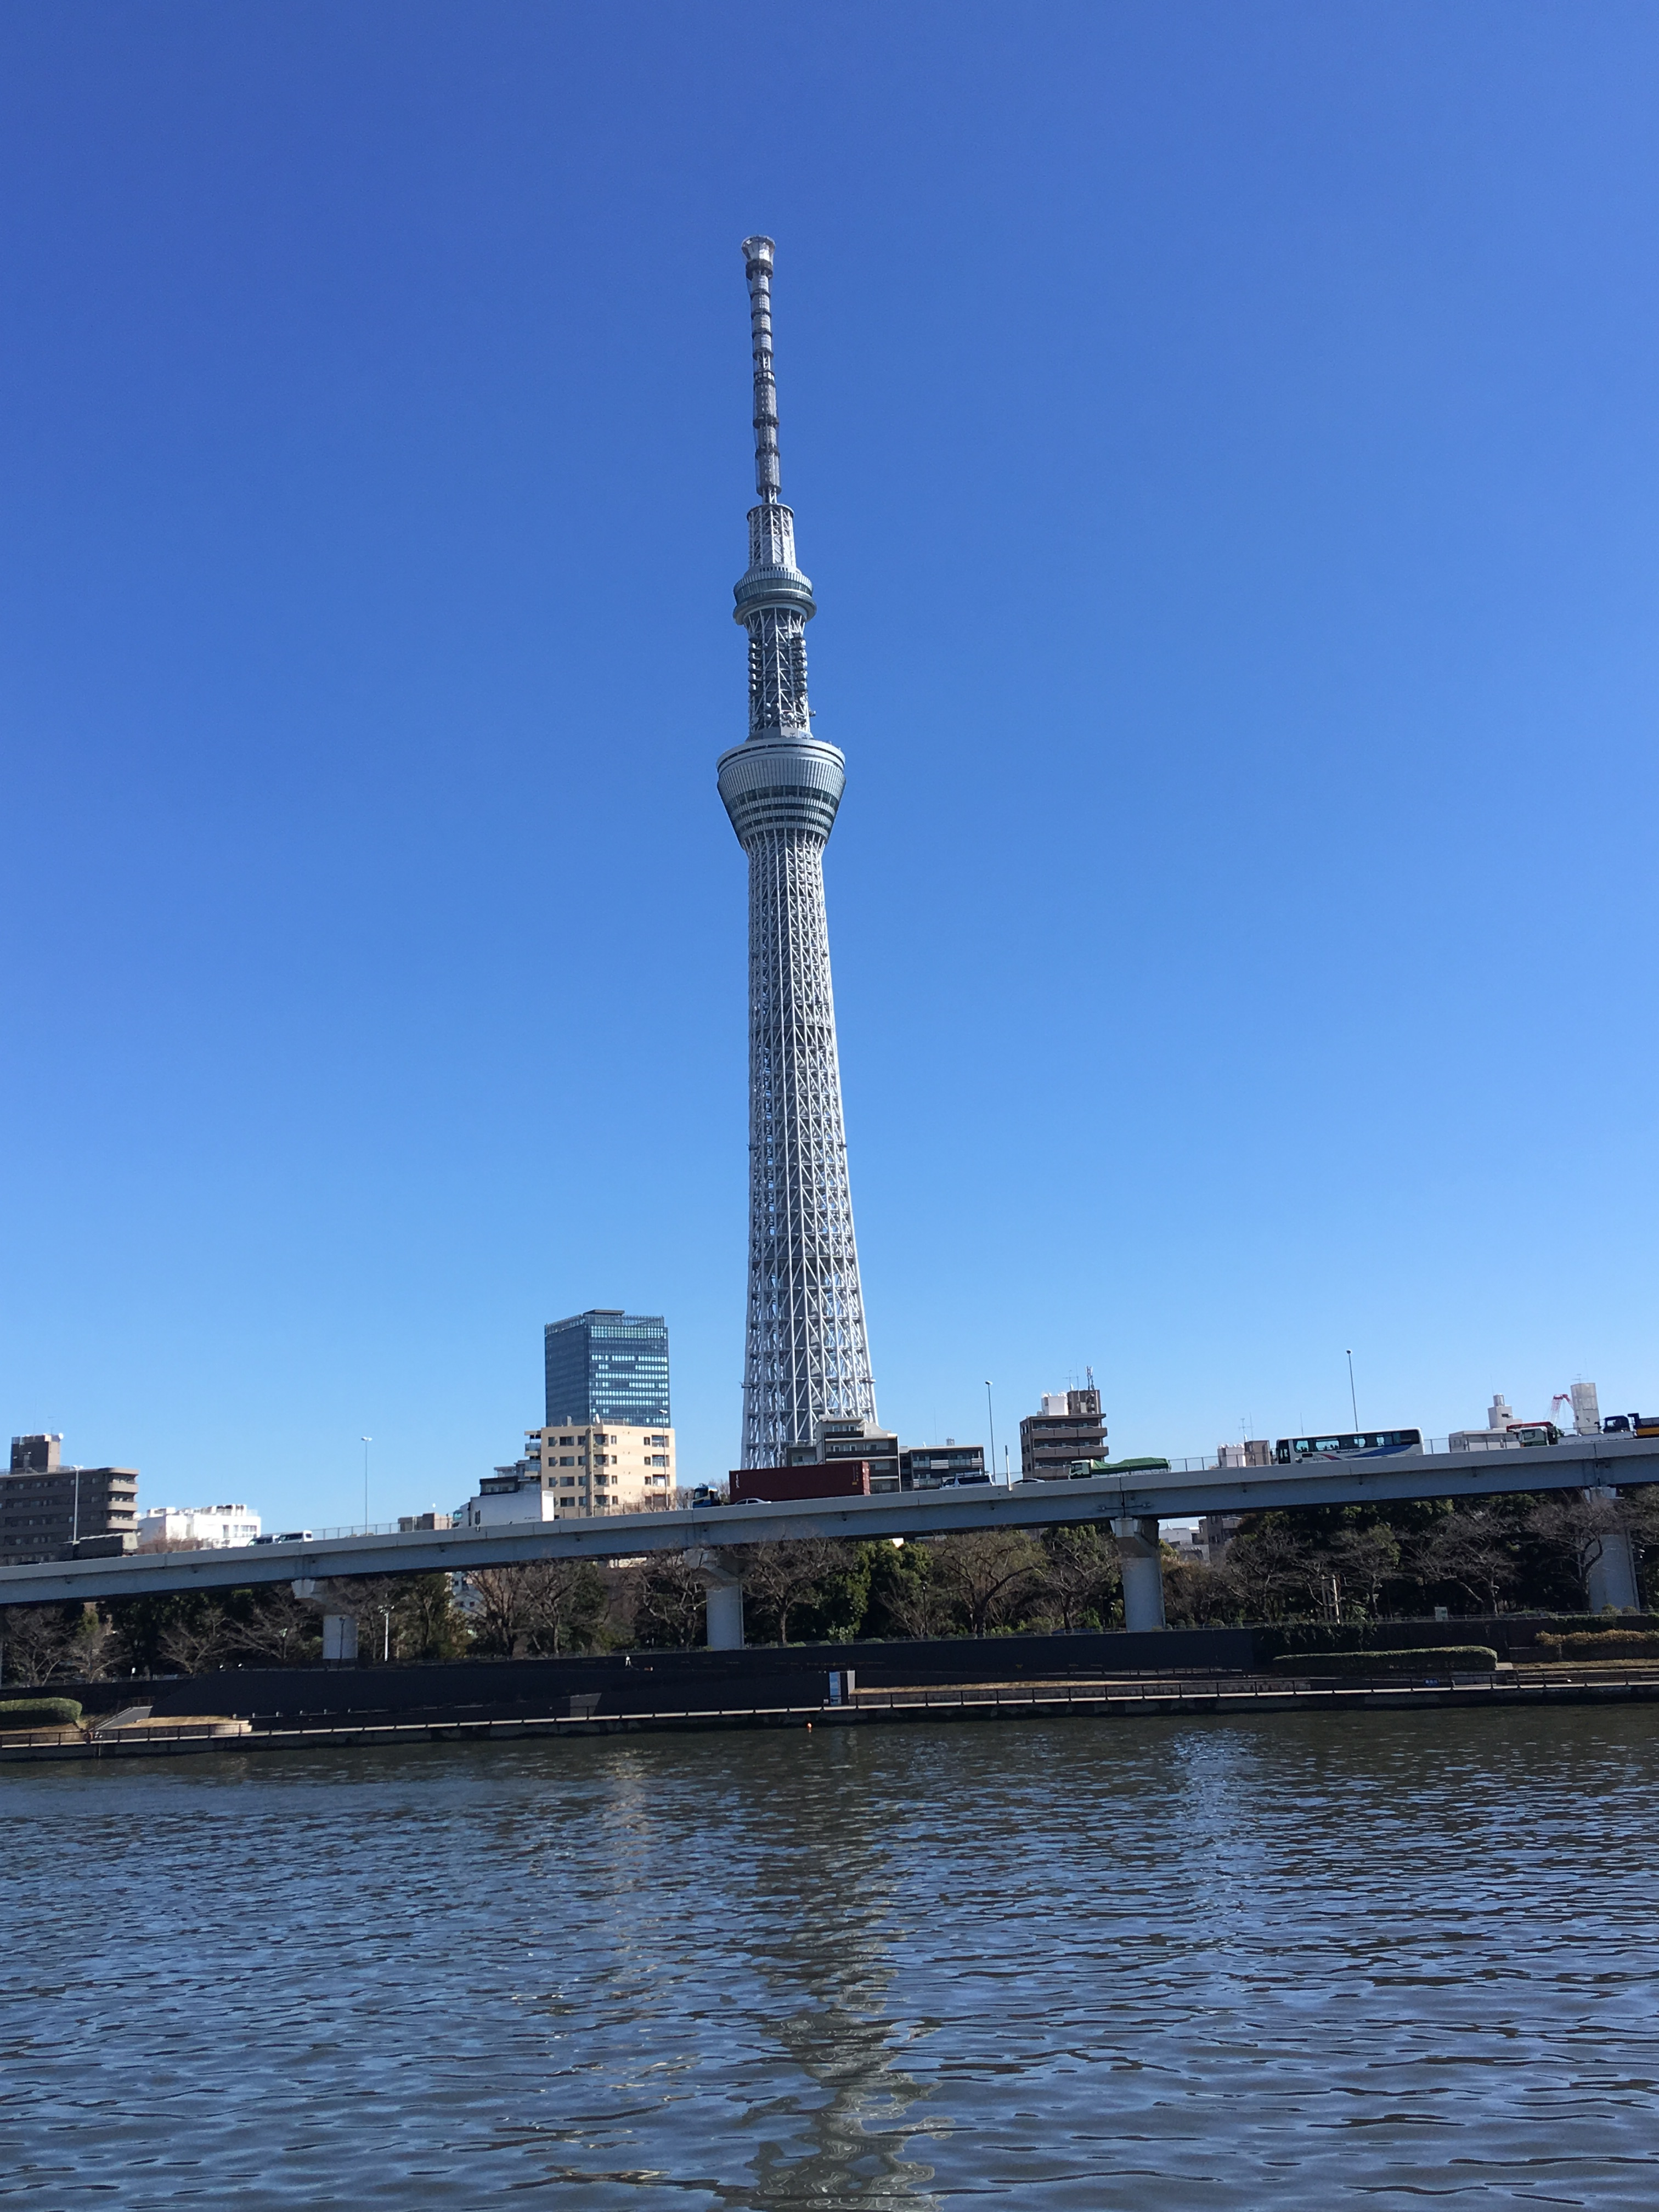 2. Tokyo Sky Tree